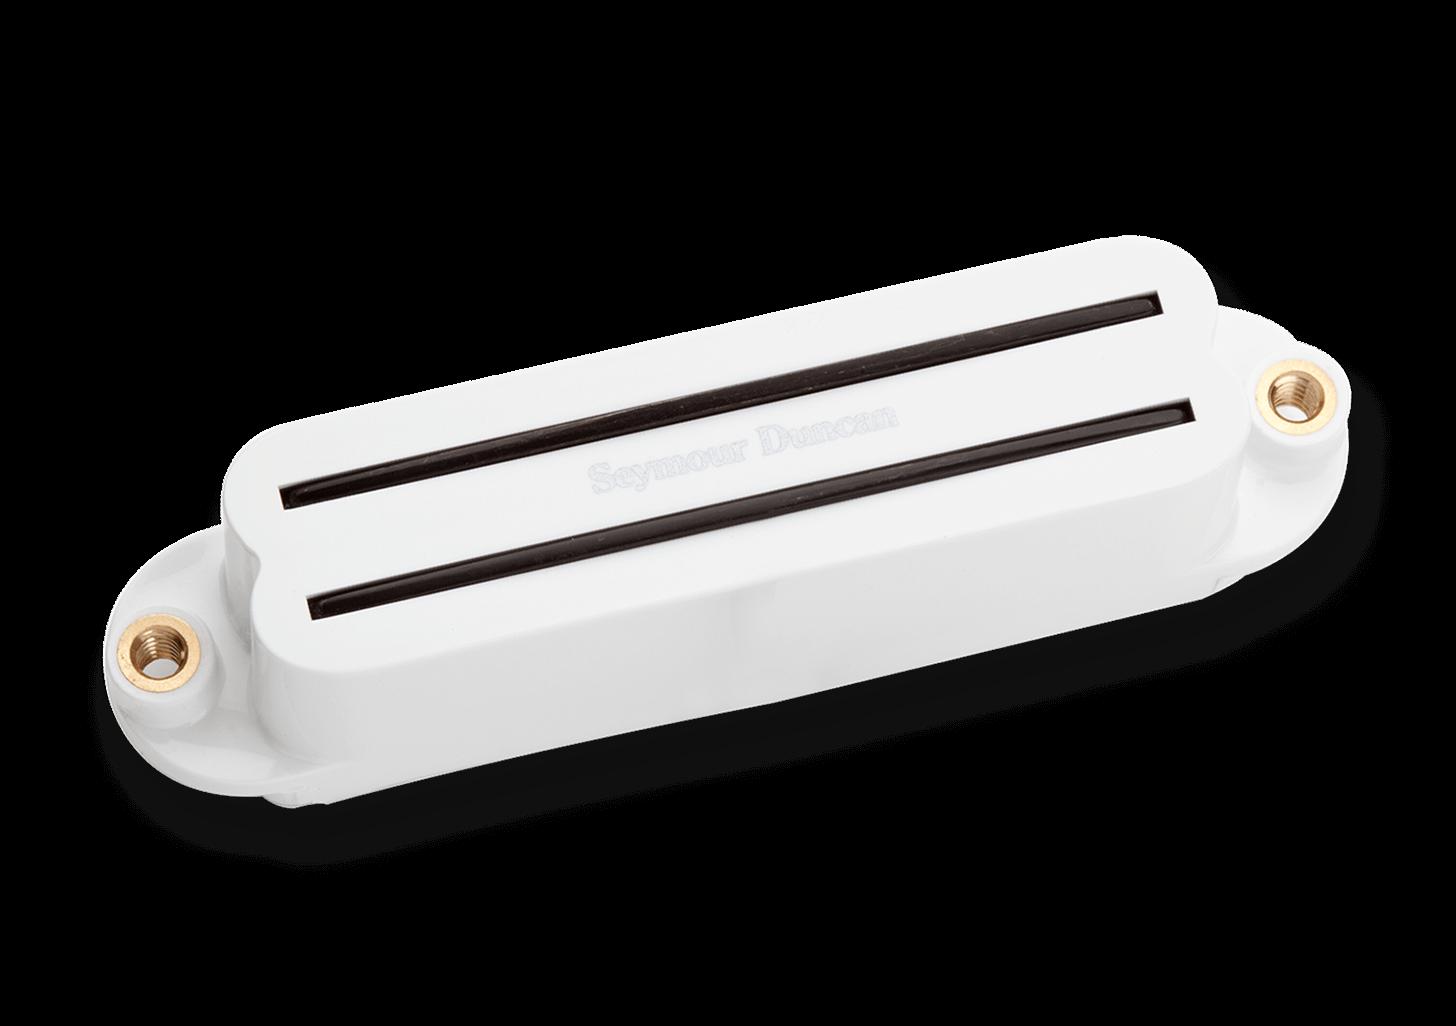 Captador mini Humbucker Hot Rails for Strat White 11205-02-WSHR-1b Ponte - SEYMOUR DUNCAN